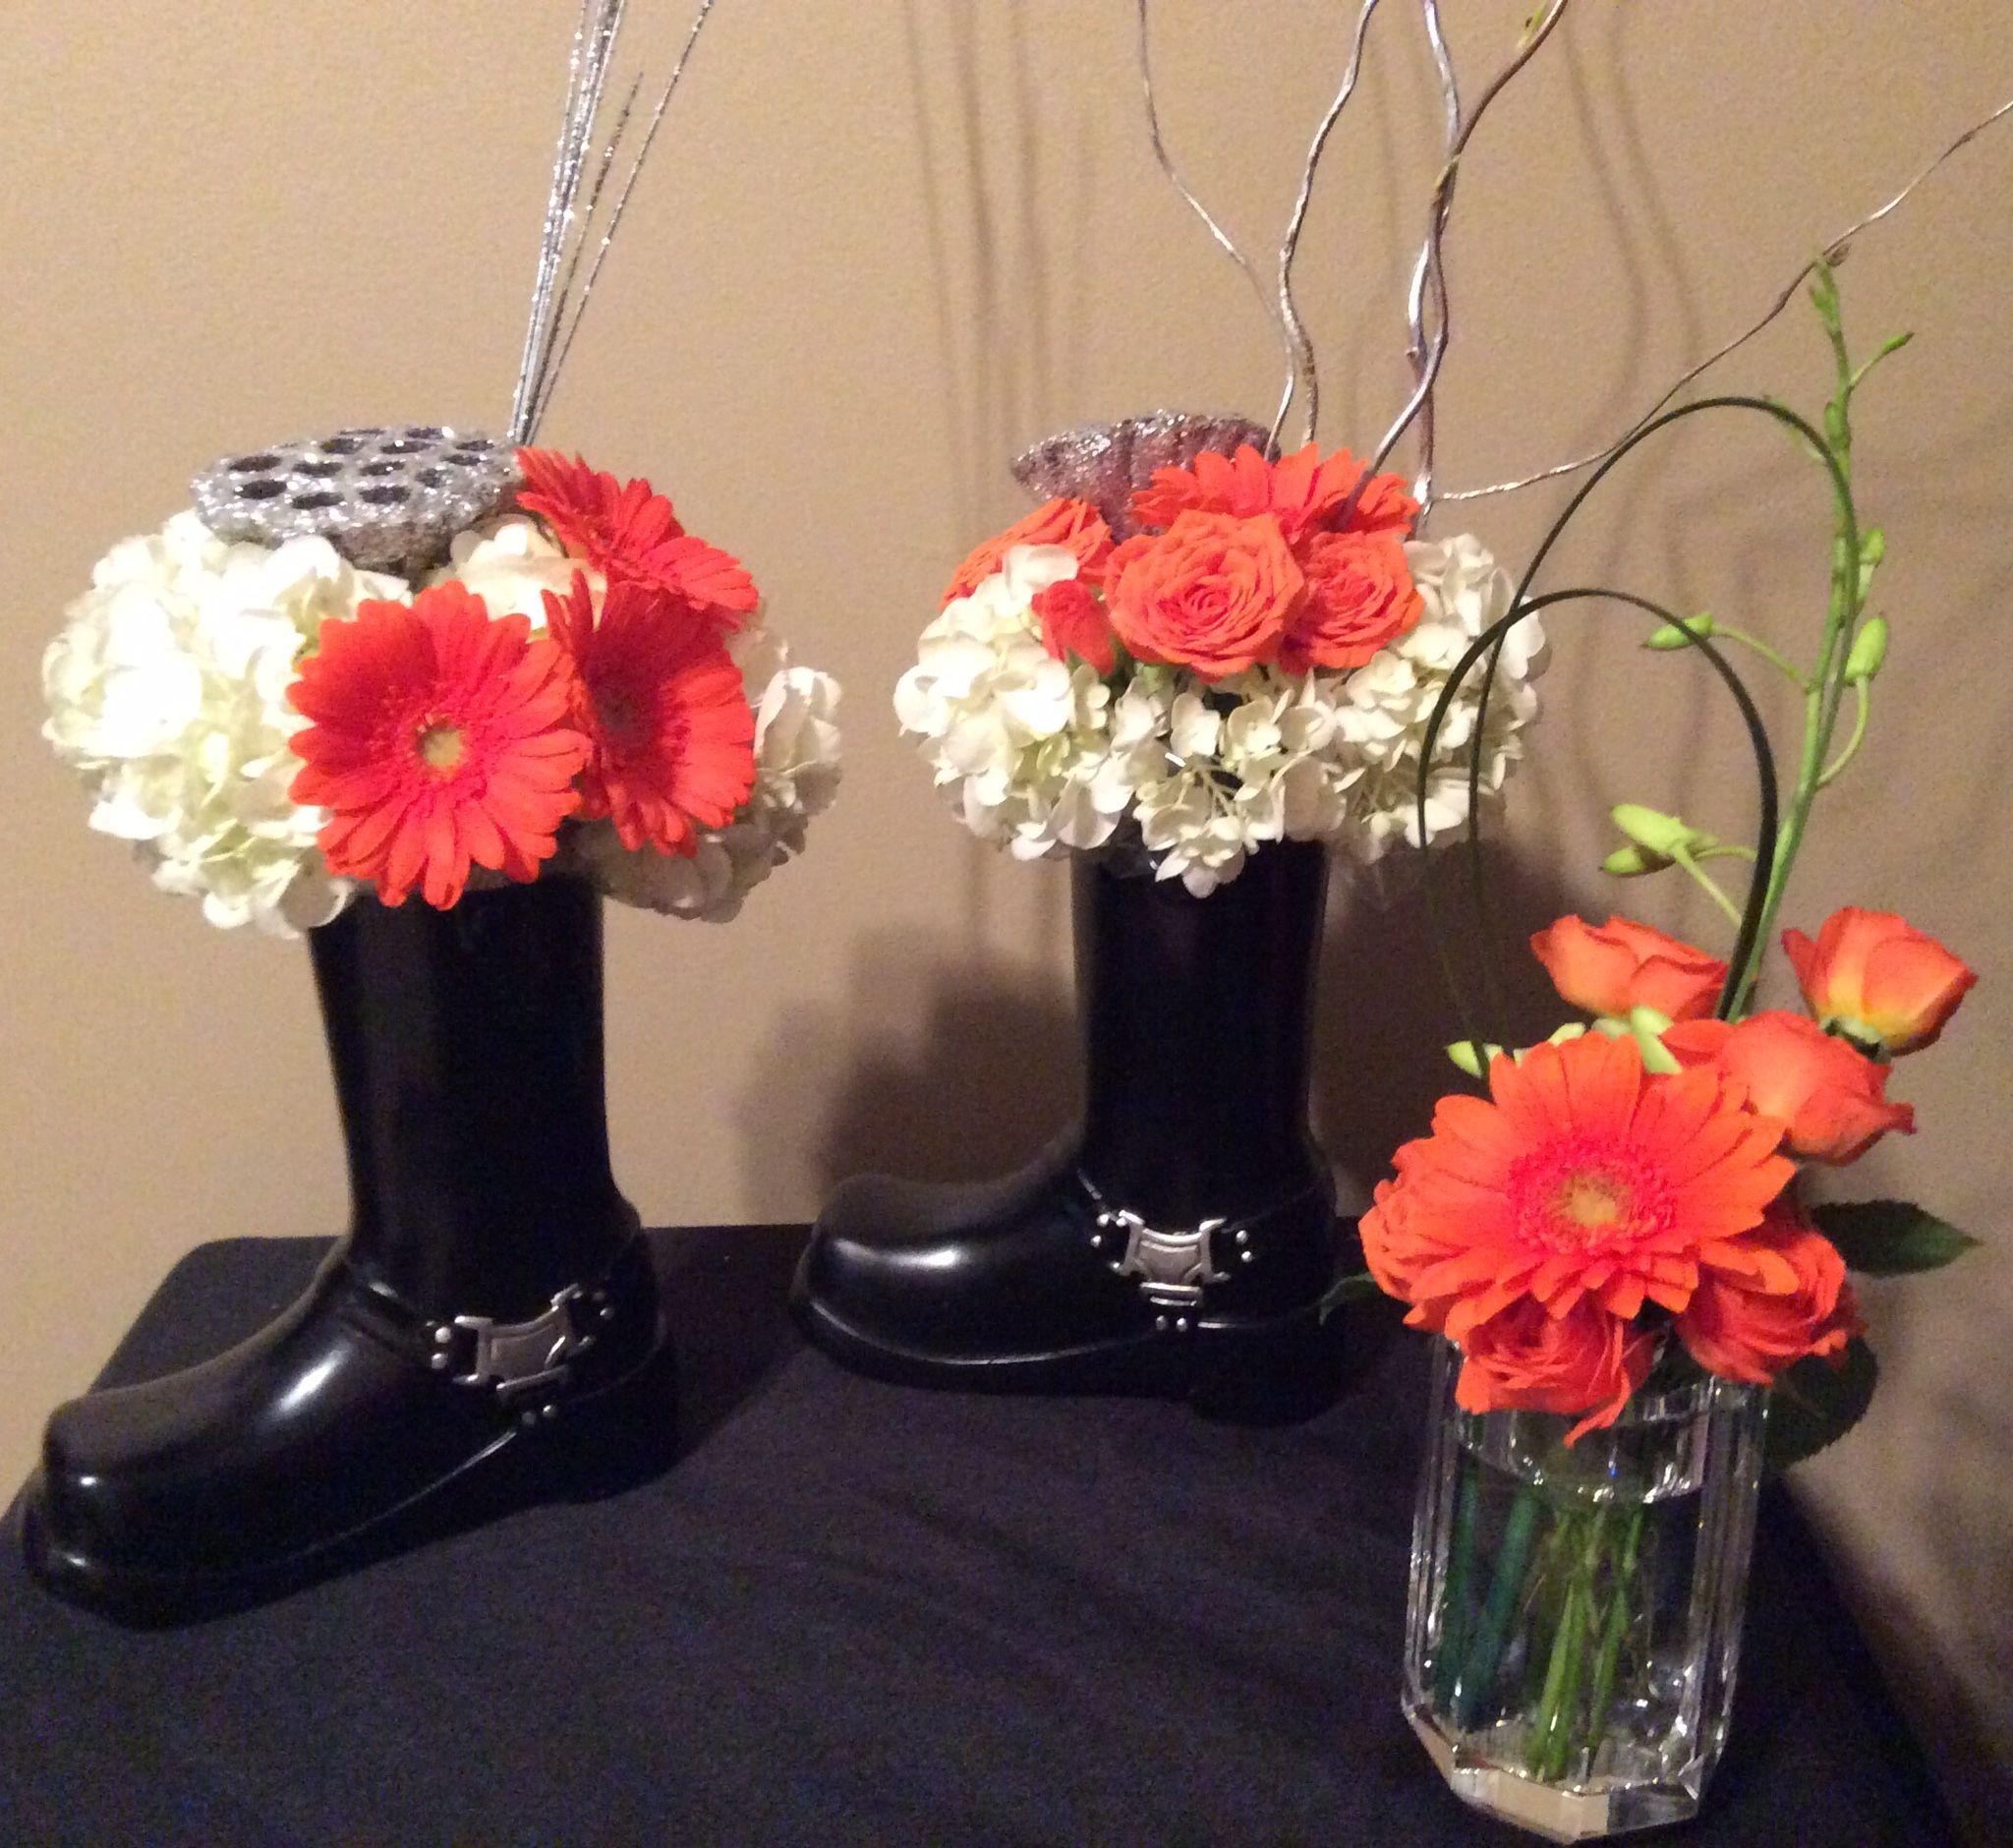 Harley davidson theme flowers orange silver floral designs in harley davidson theme flowers orange silver floral designs in black boot vase containers reviewsmspy